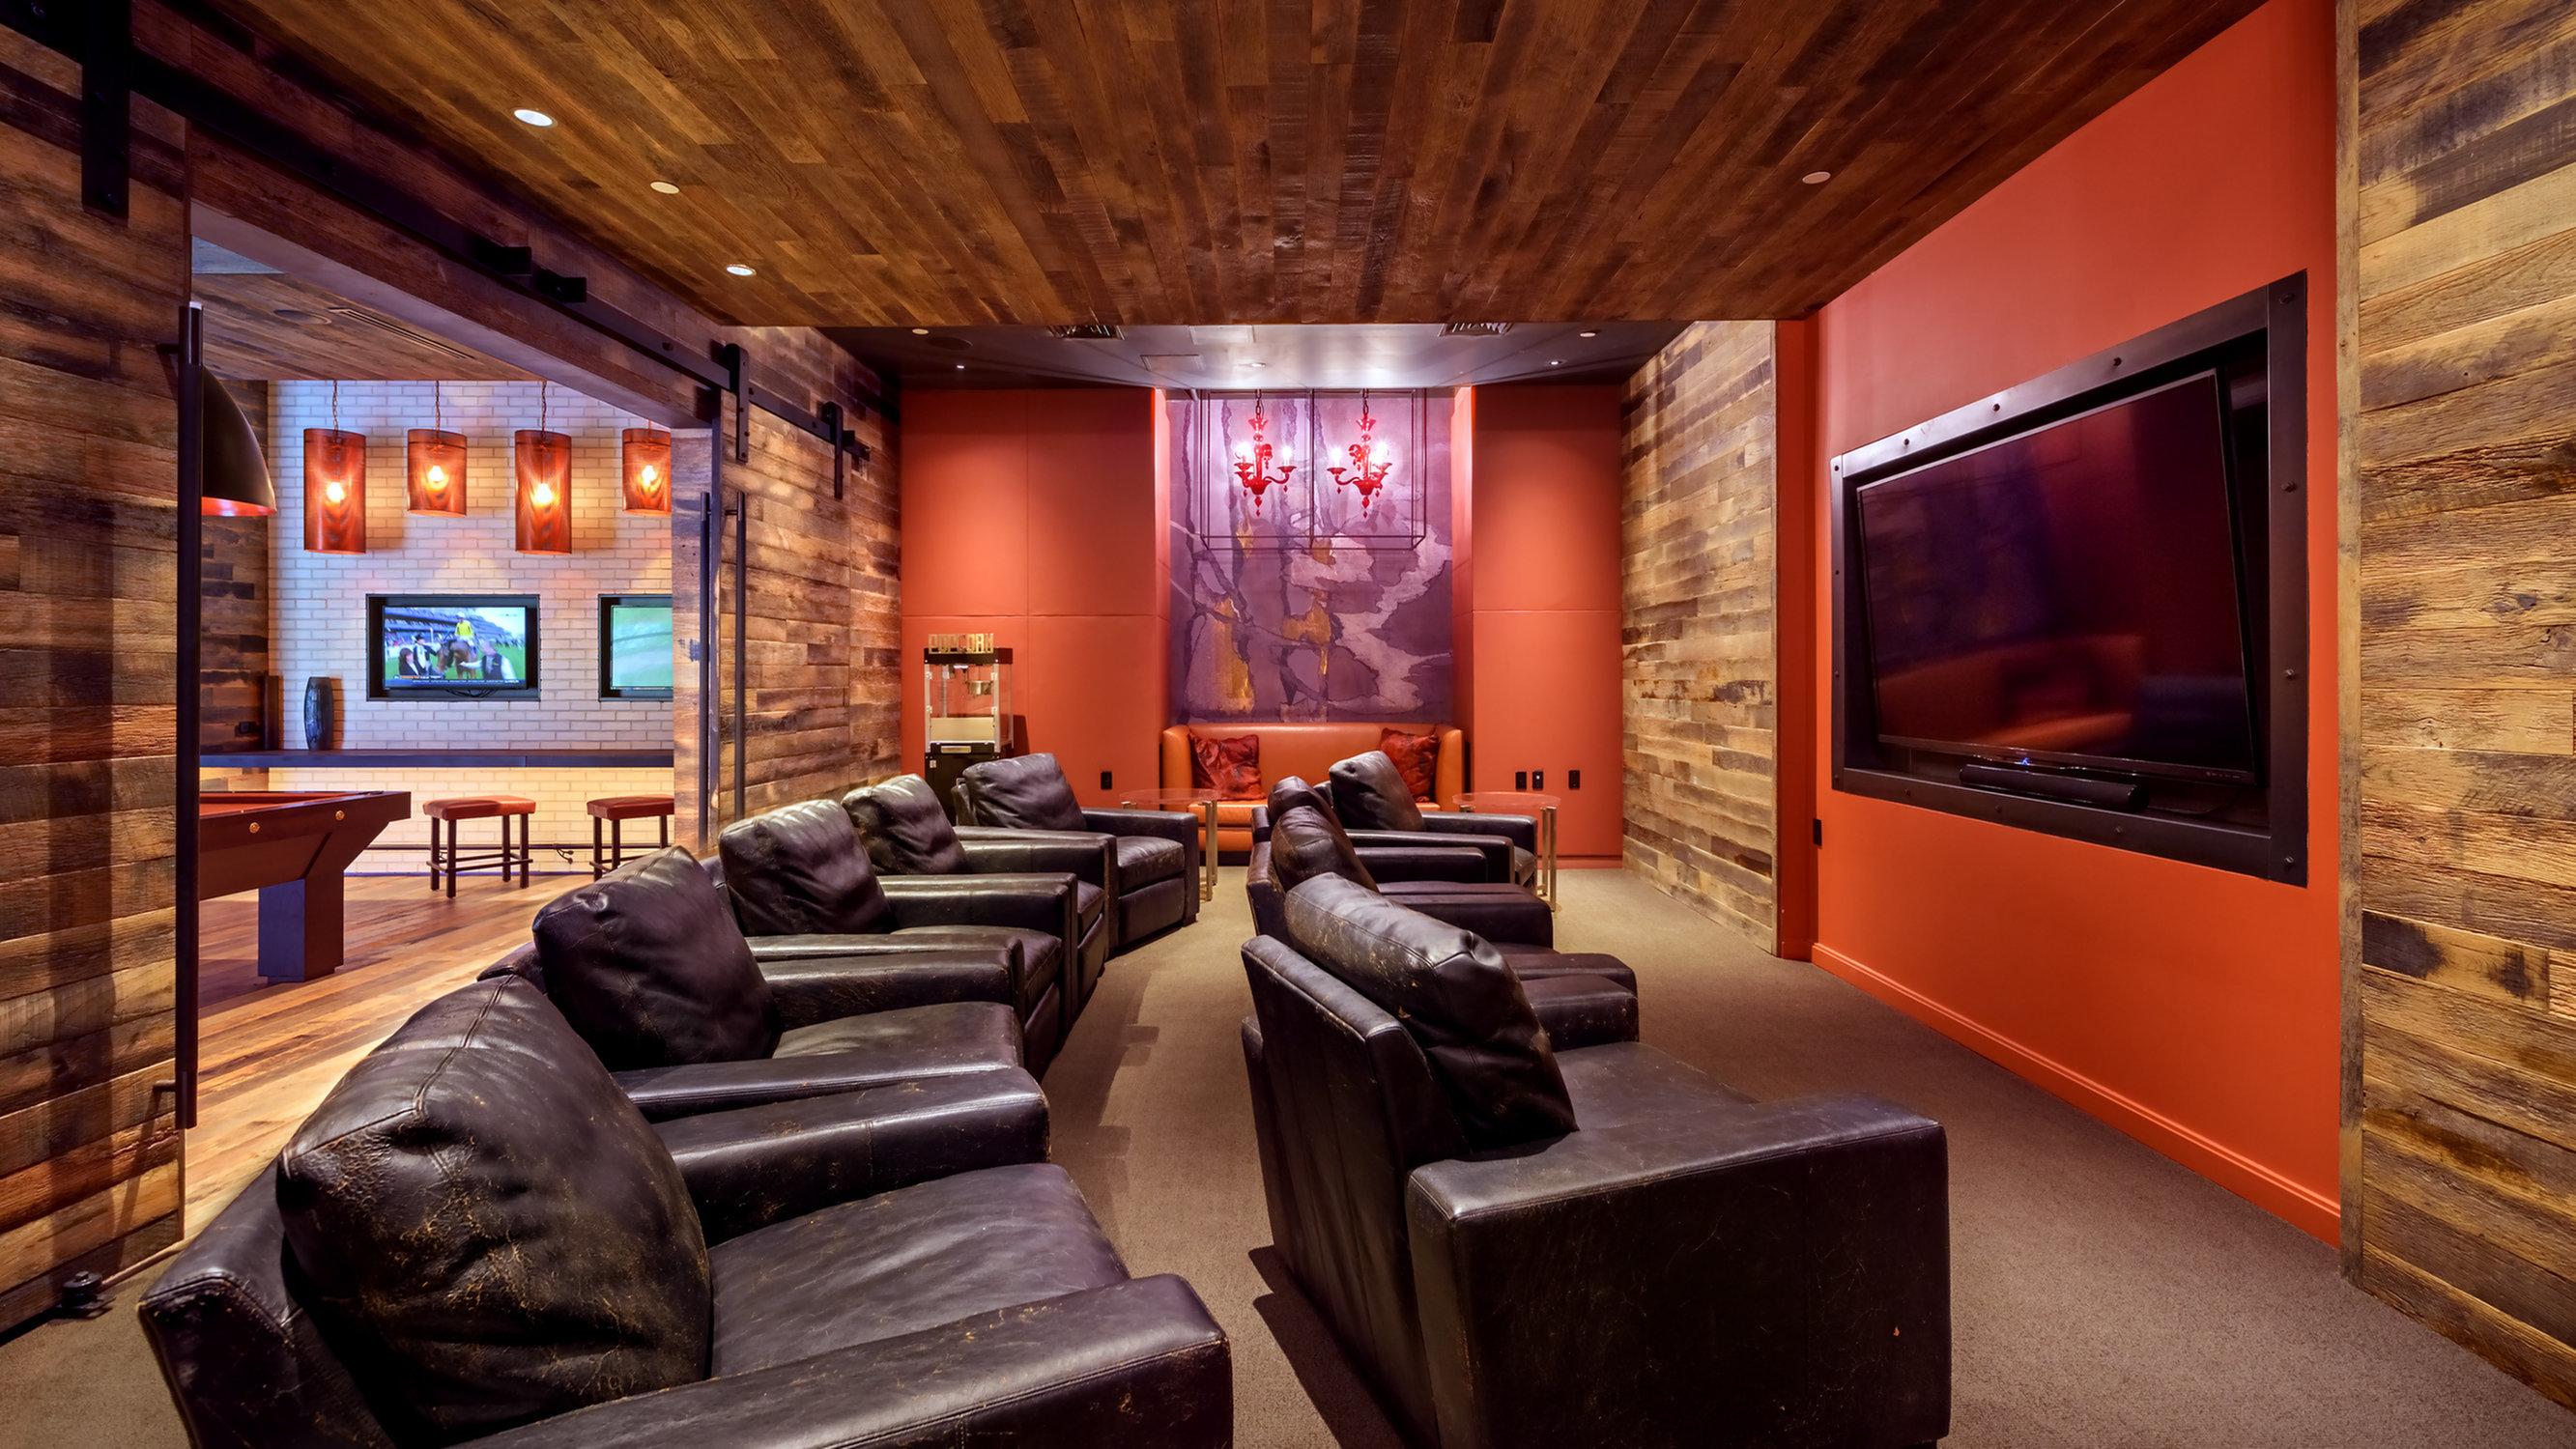 Image of Theatre Room for Eastside Bond